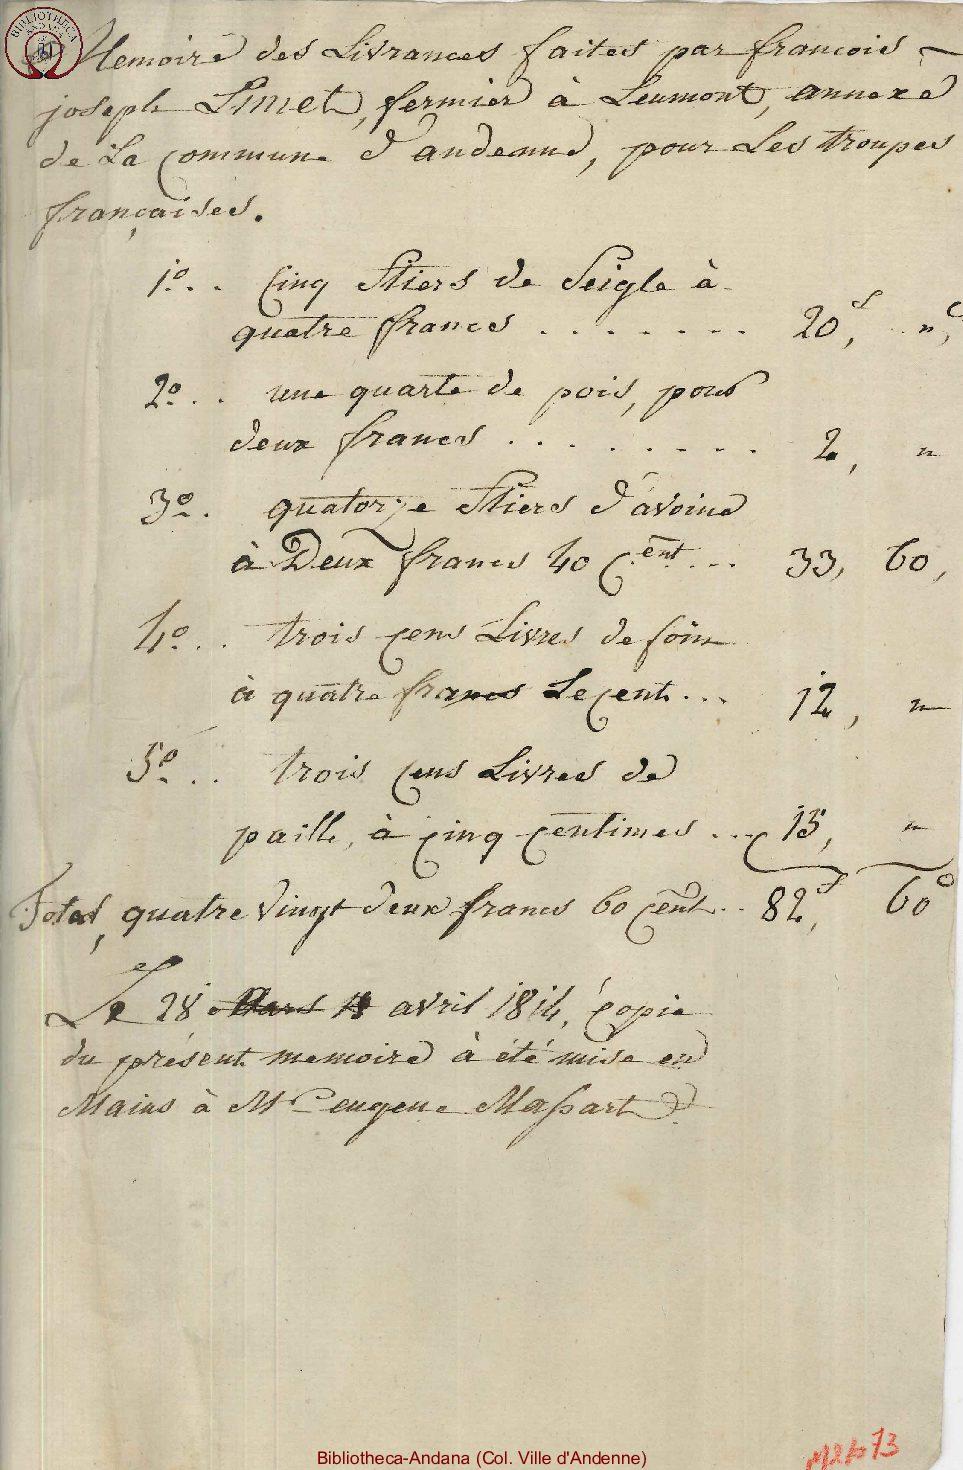 1814-04-28